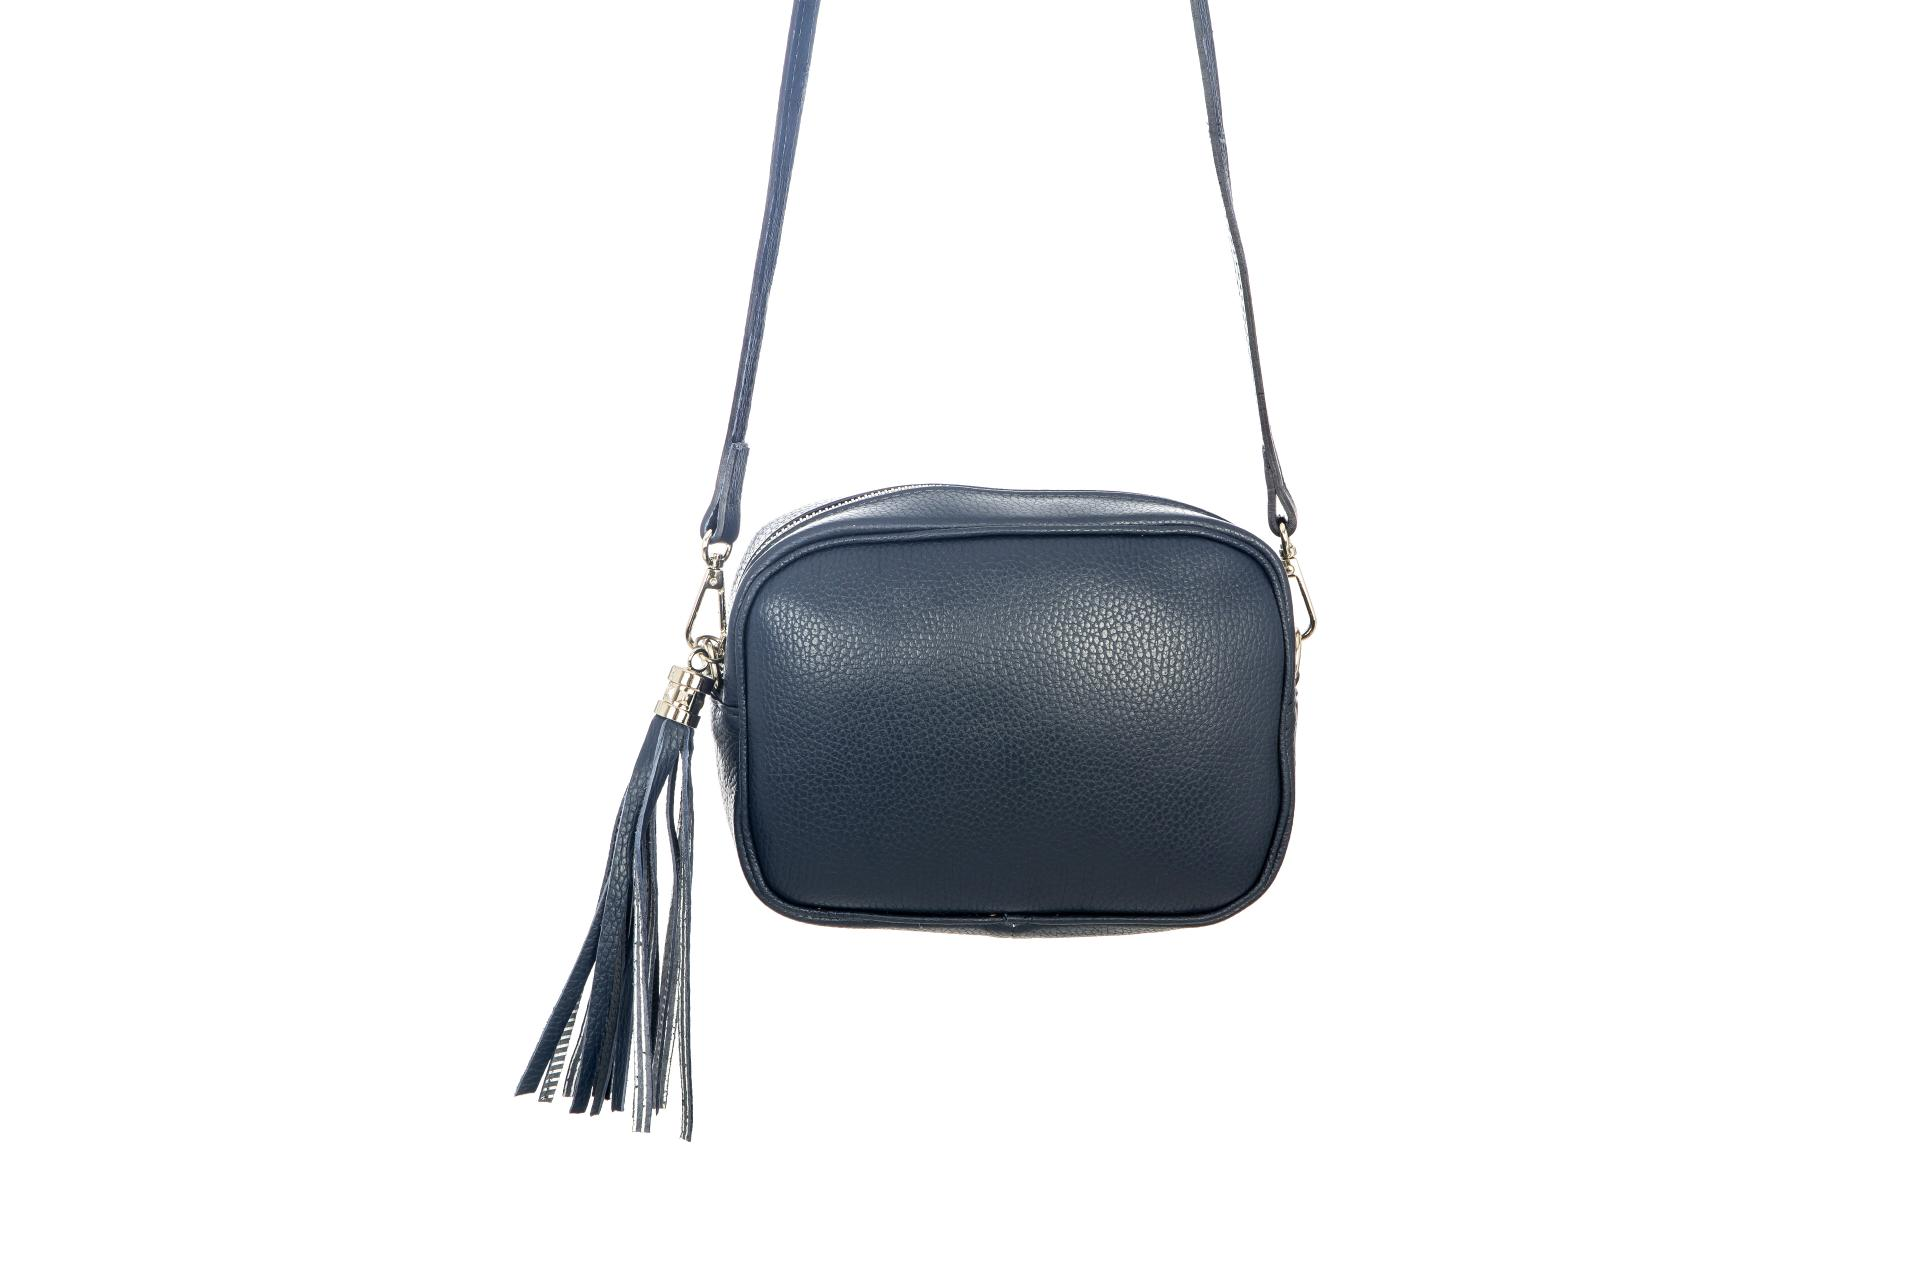 bolso de piel borla azul marino 285.jpg